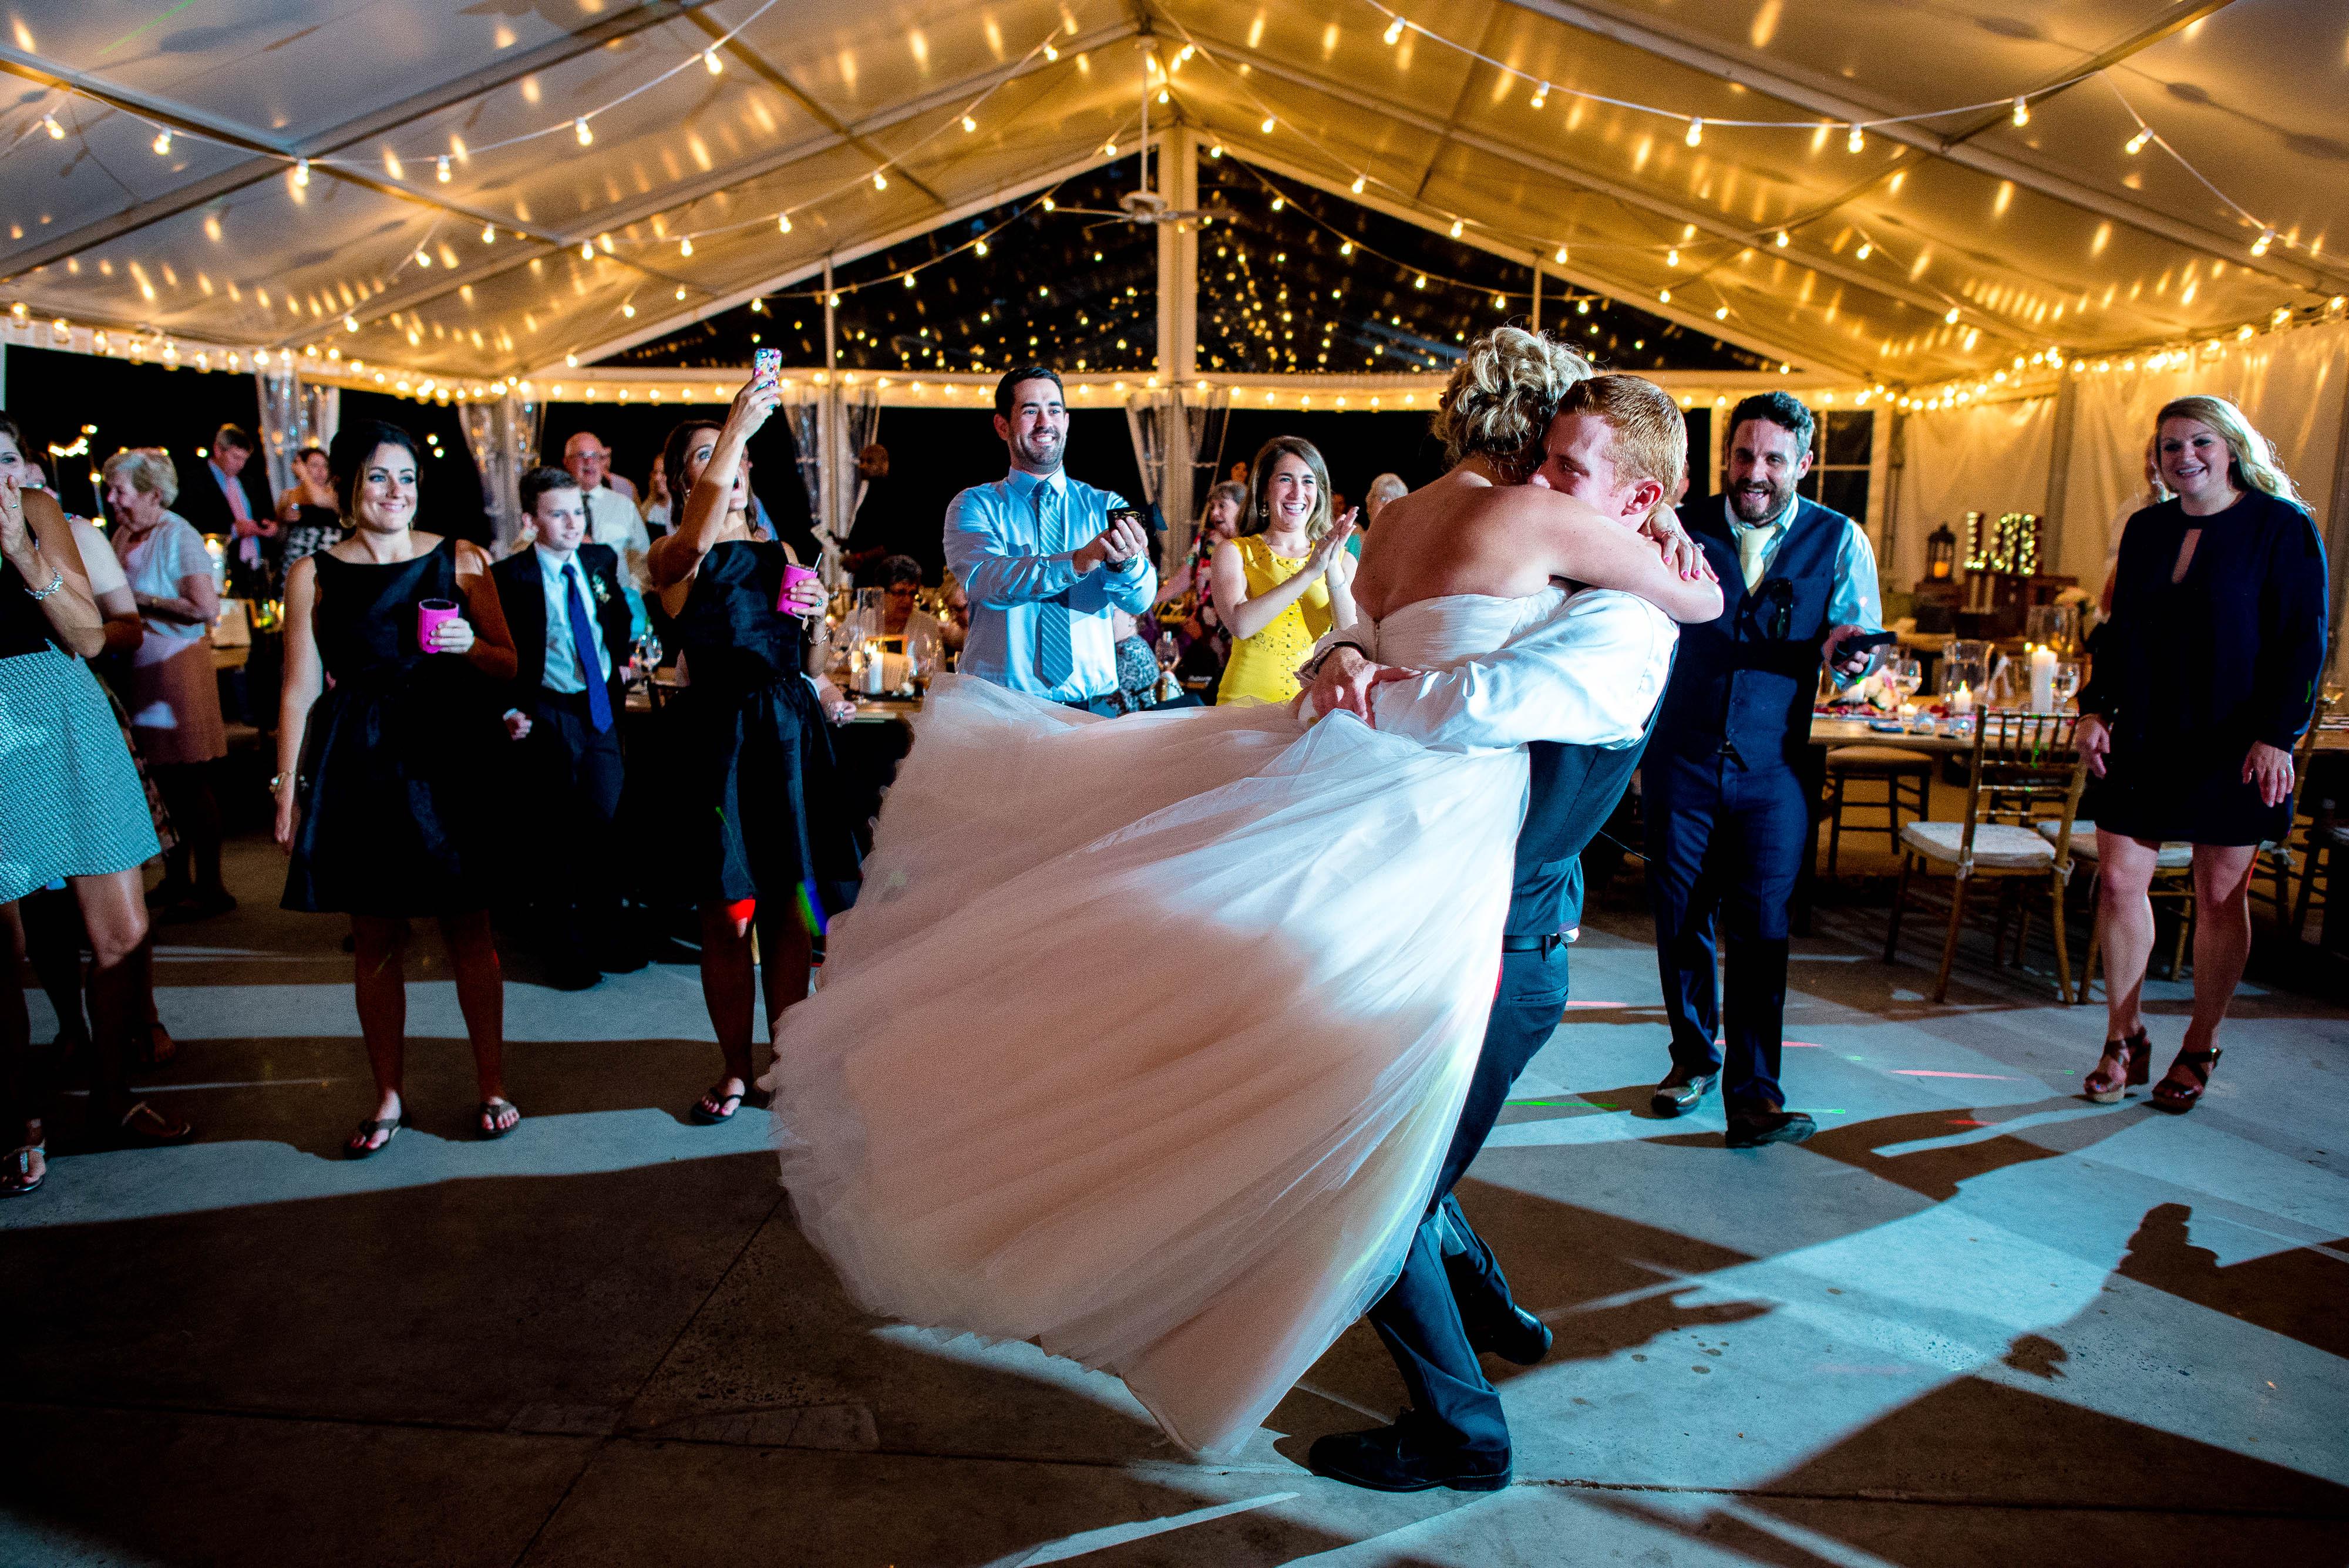 Anthony Wayne House Wedding Venue In Philadelphia Partyspace